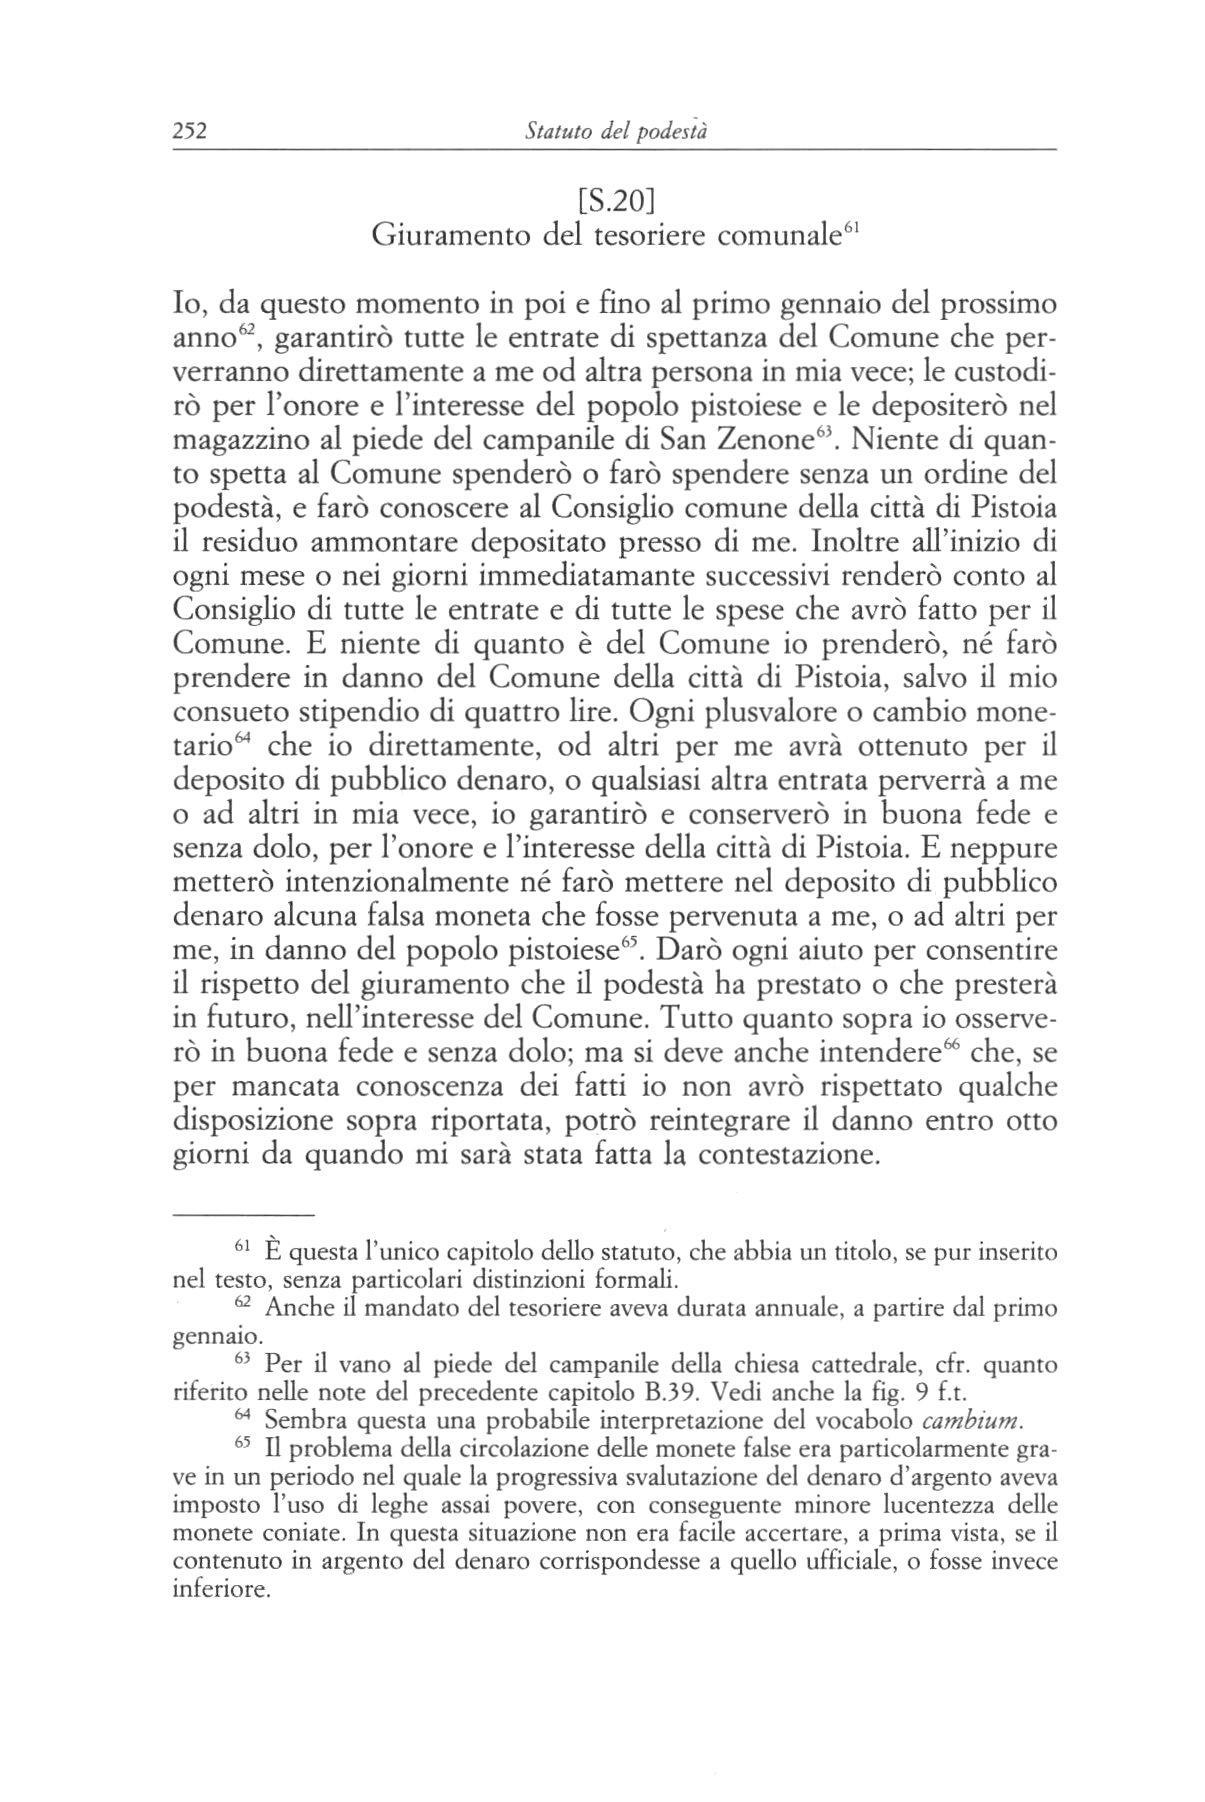 statuti pistoiesi del sec.XII 0252.jpg